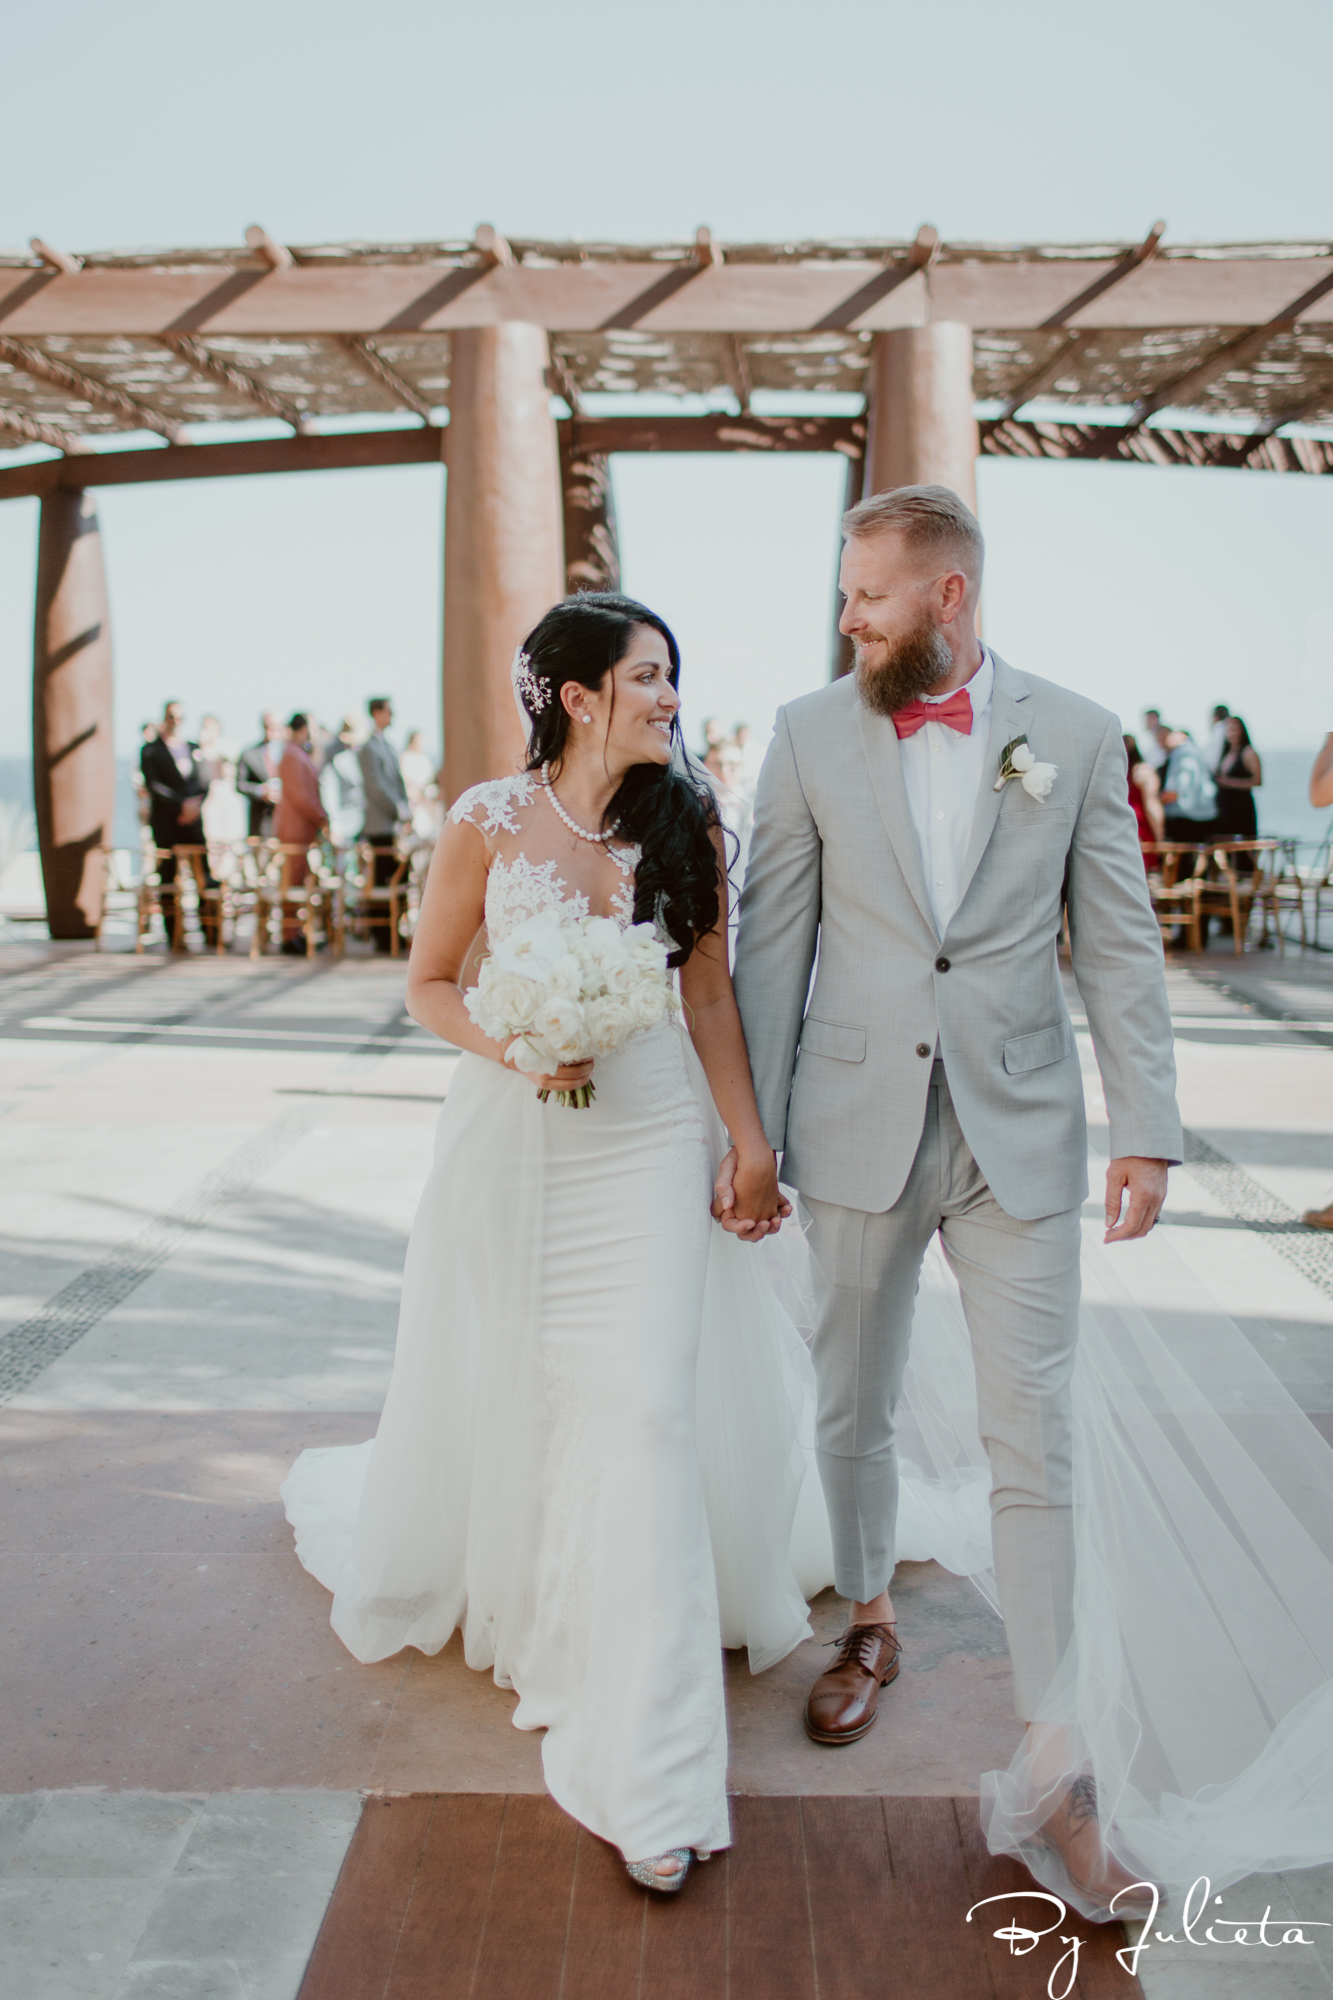 The Resort at Pedregal Wedding. T+C. Julieta Amezcua Photography.424.JPG